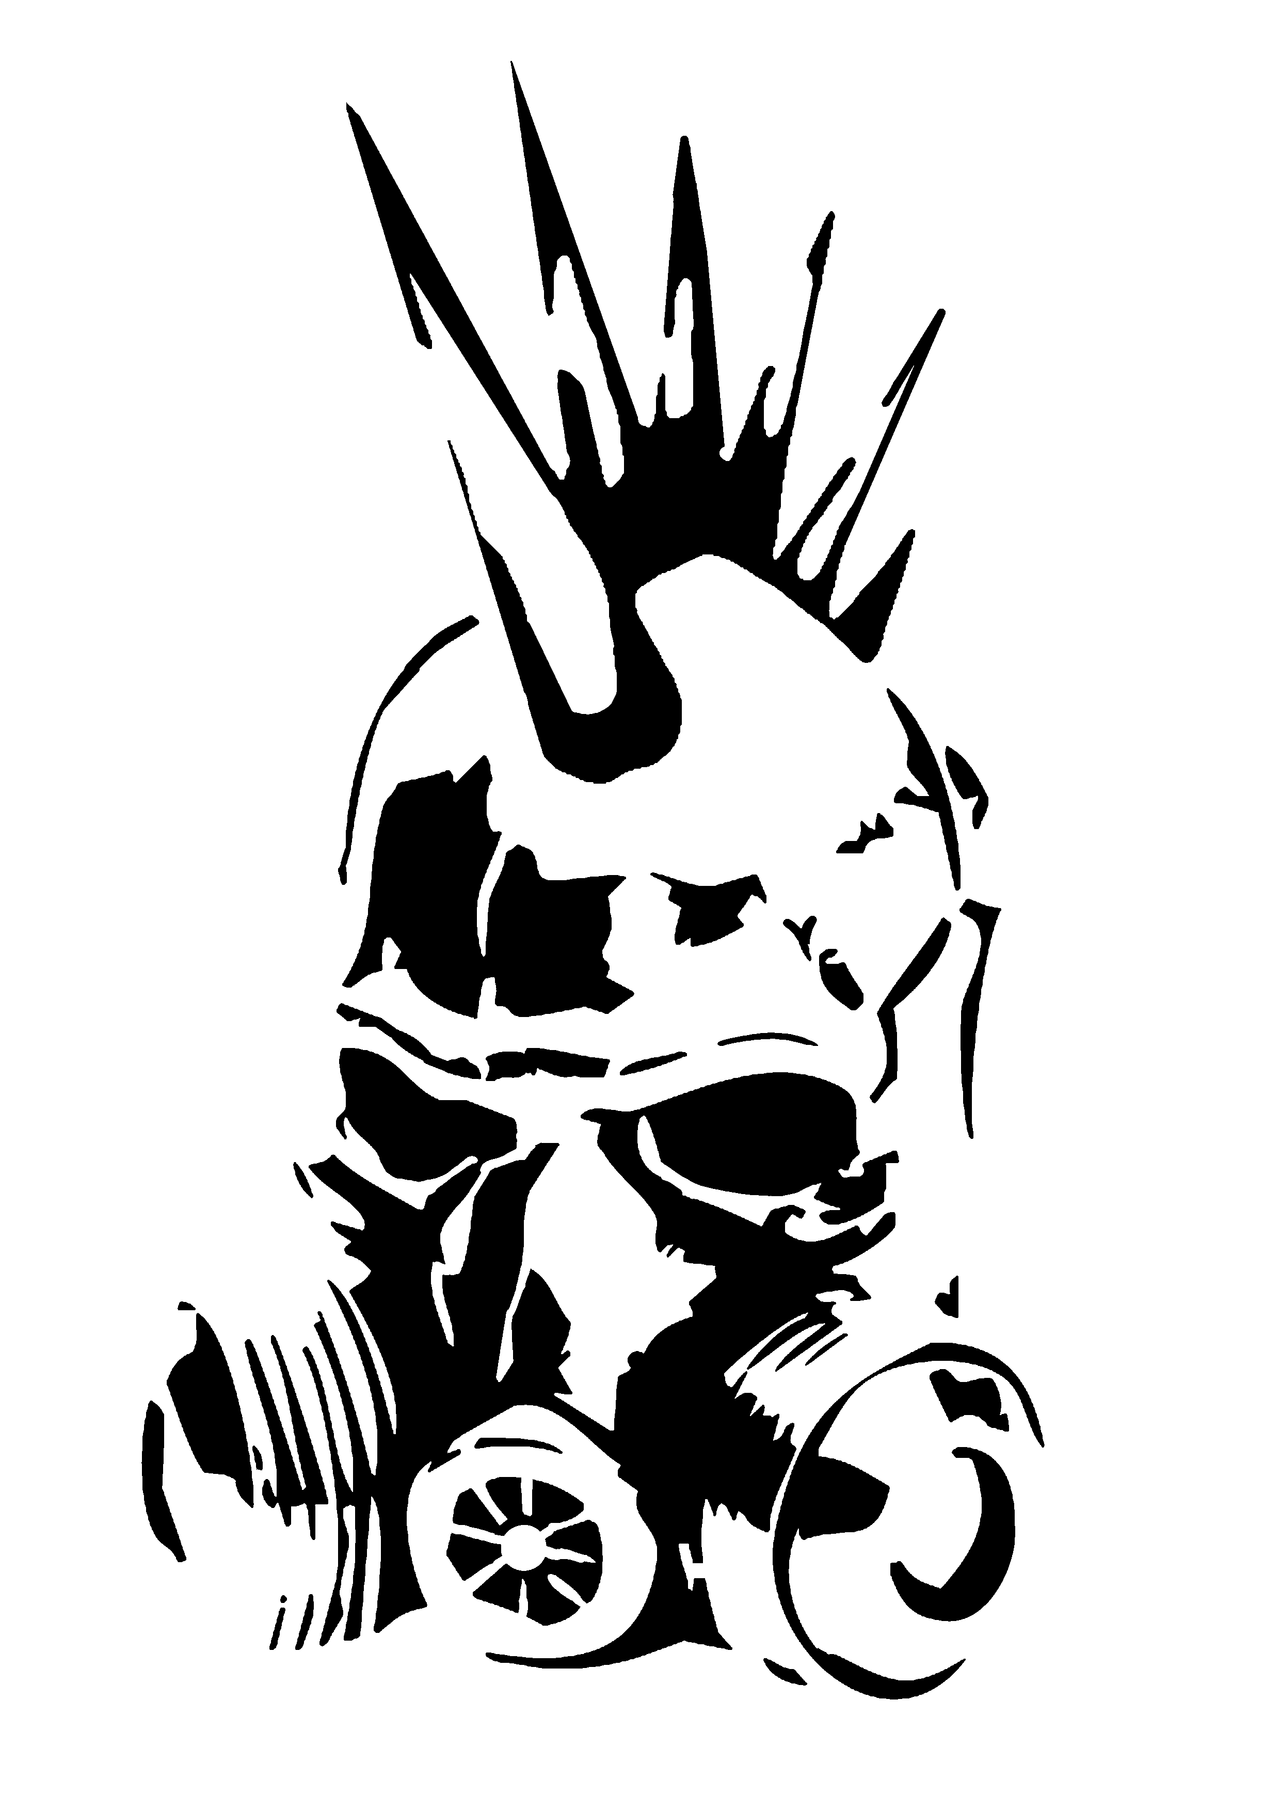 Punk Gas Mask Stencil By Skayp In